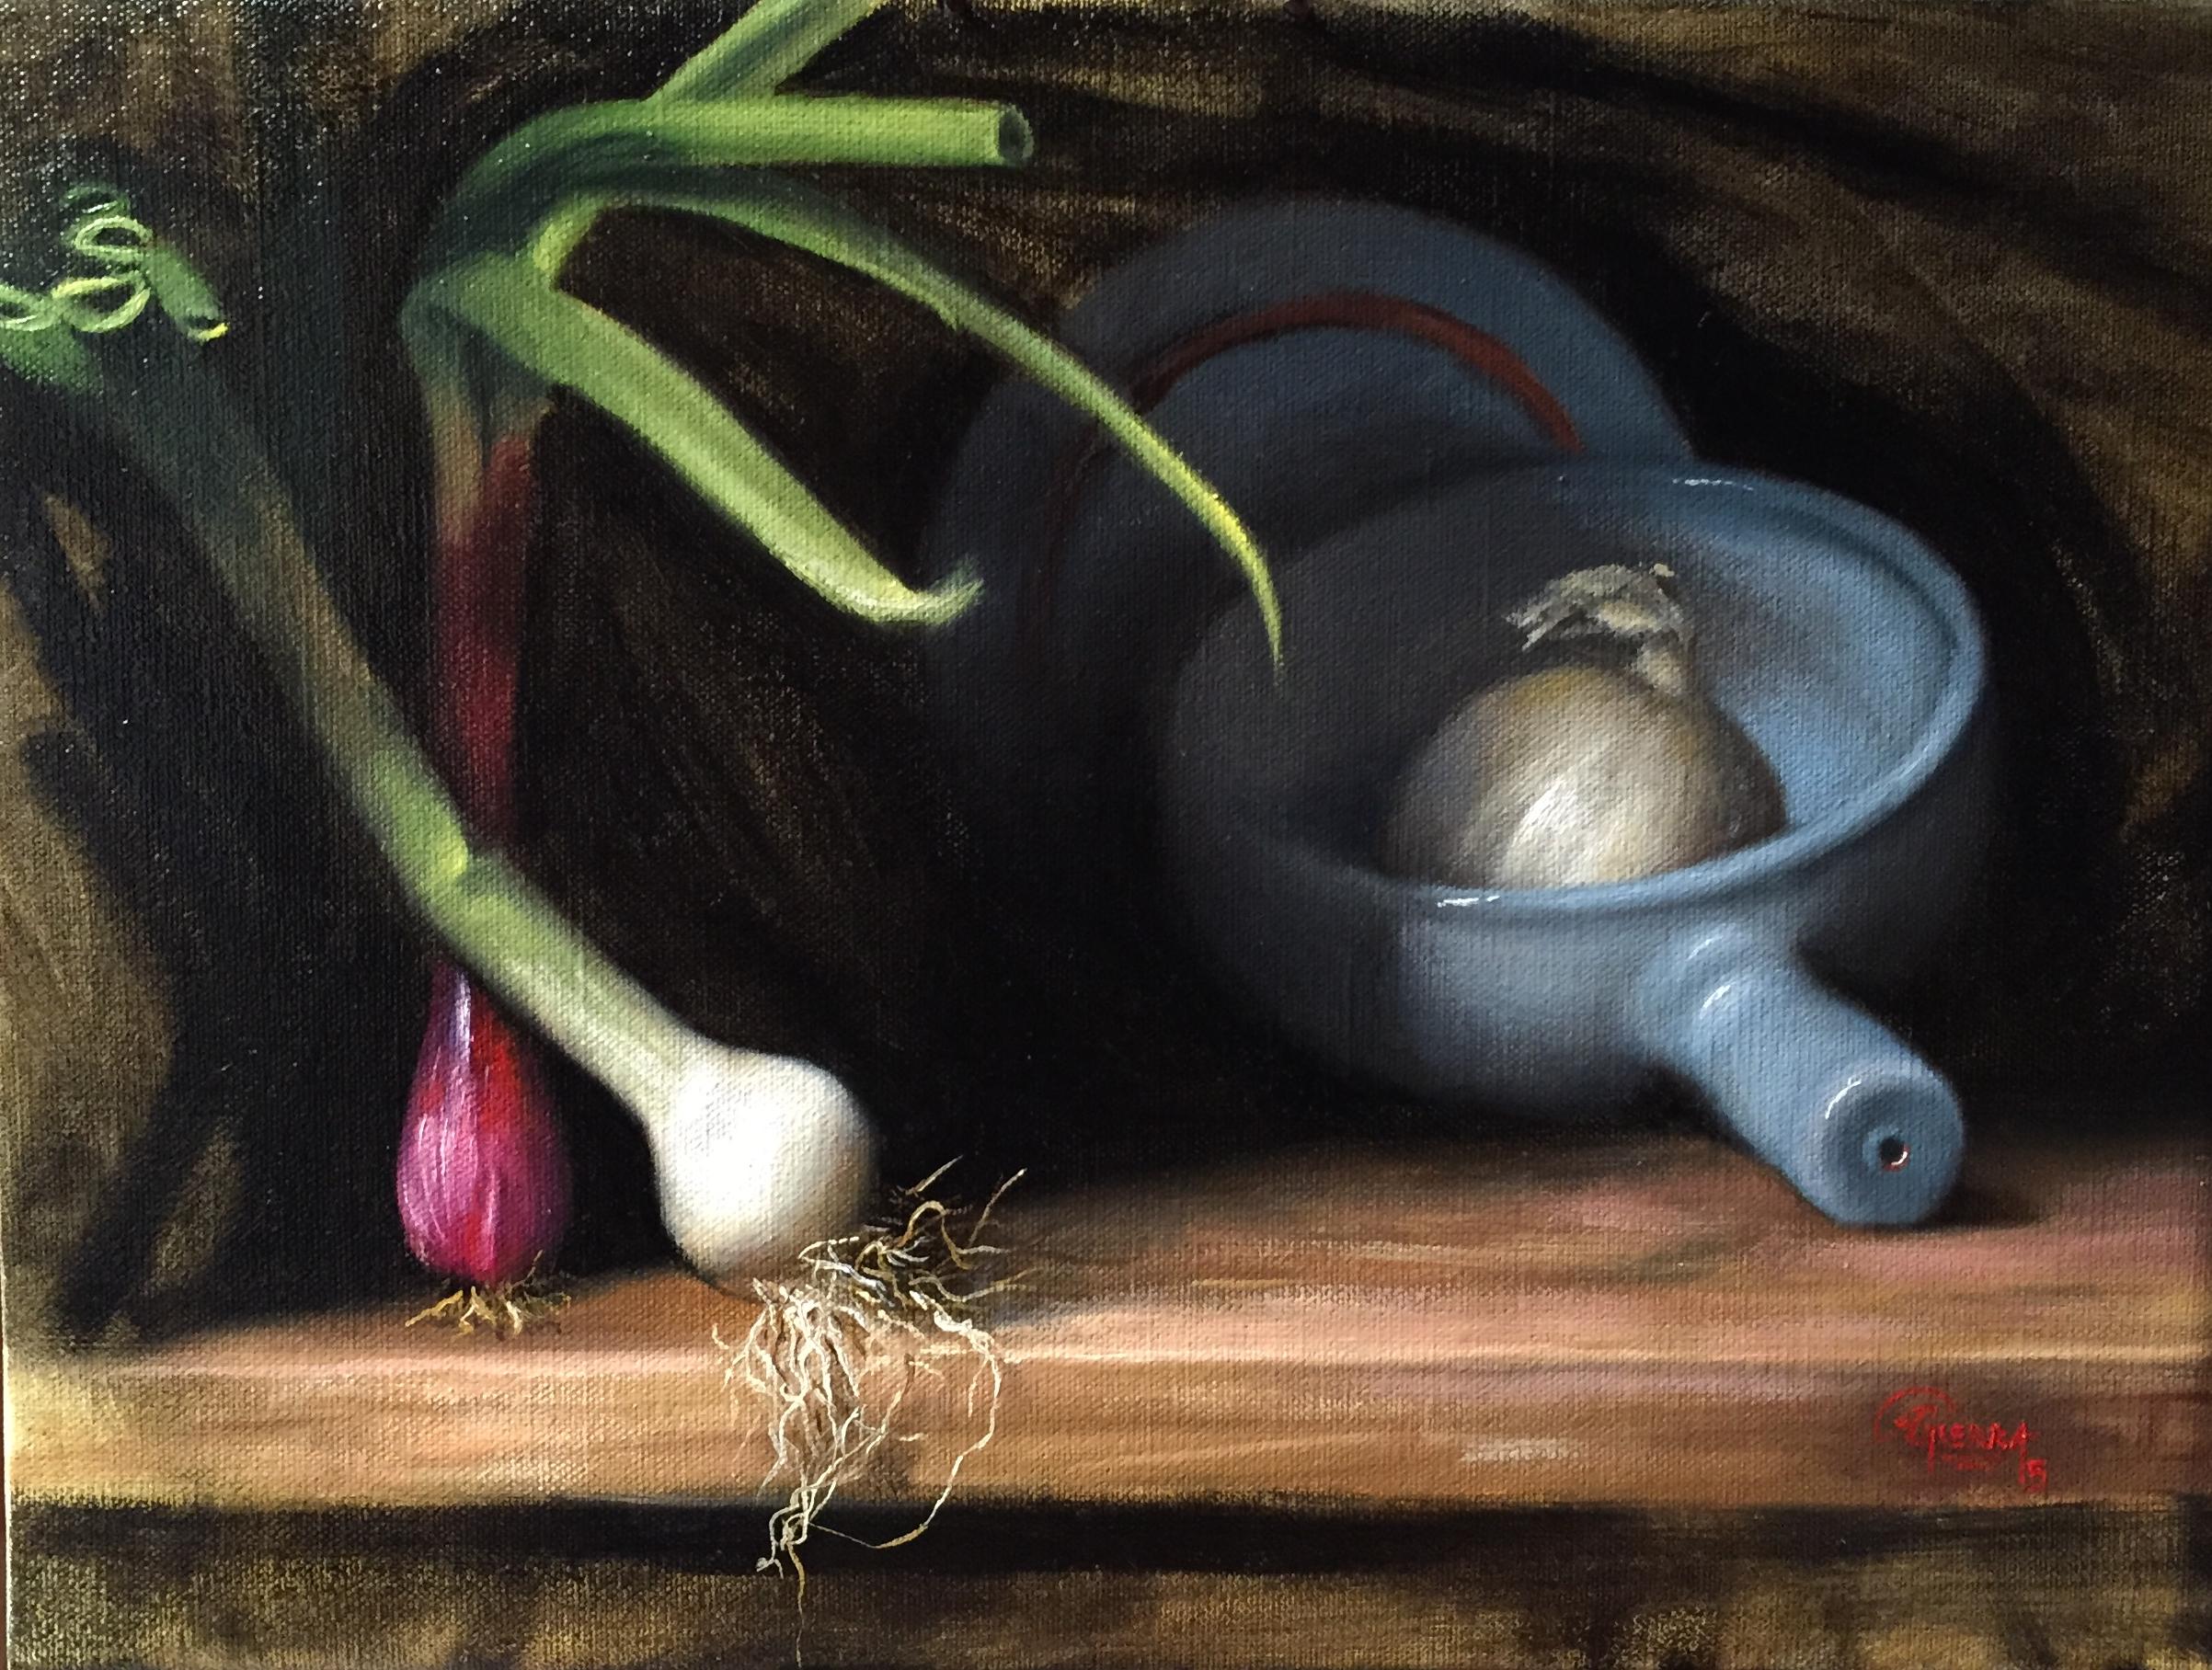 White Onion, Rafael Guerra Painting Pintura